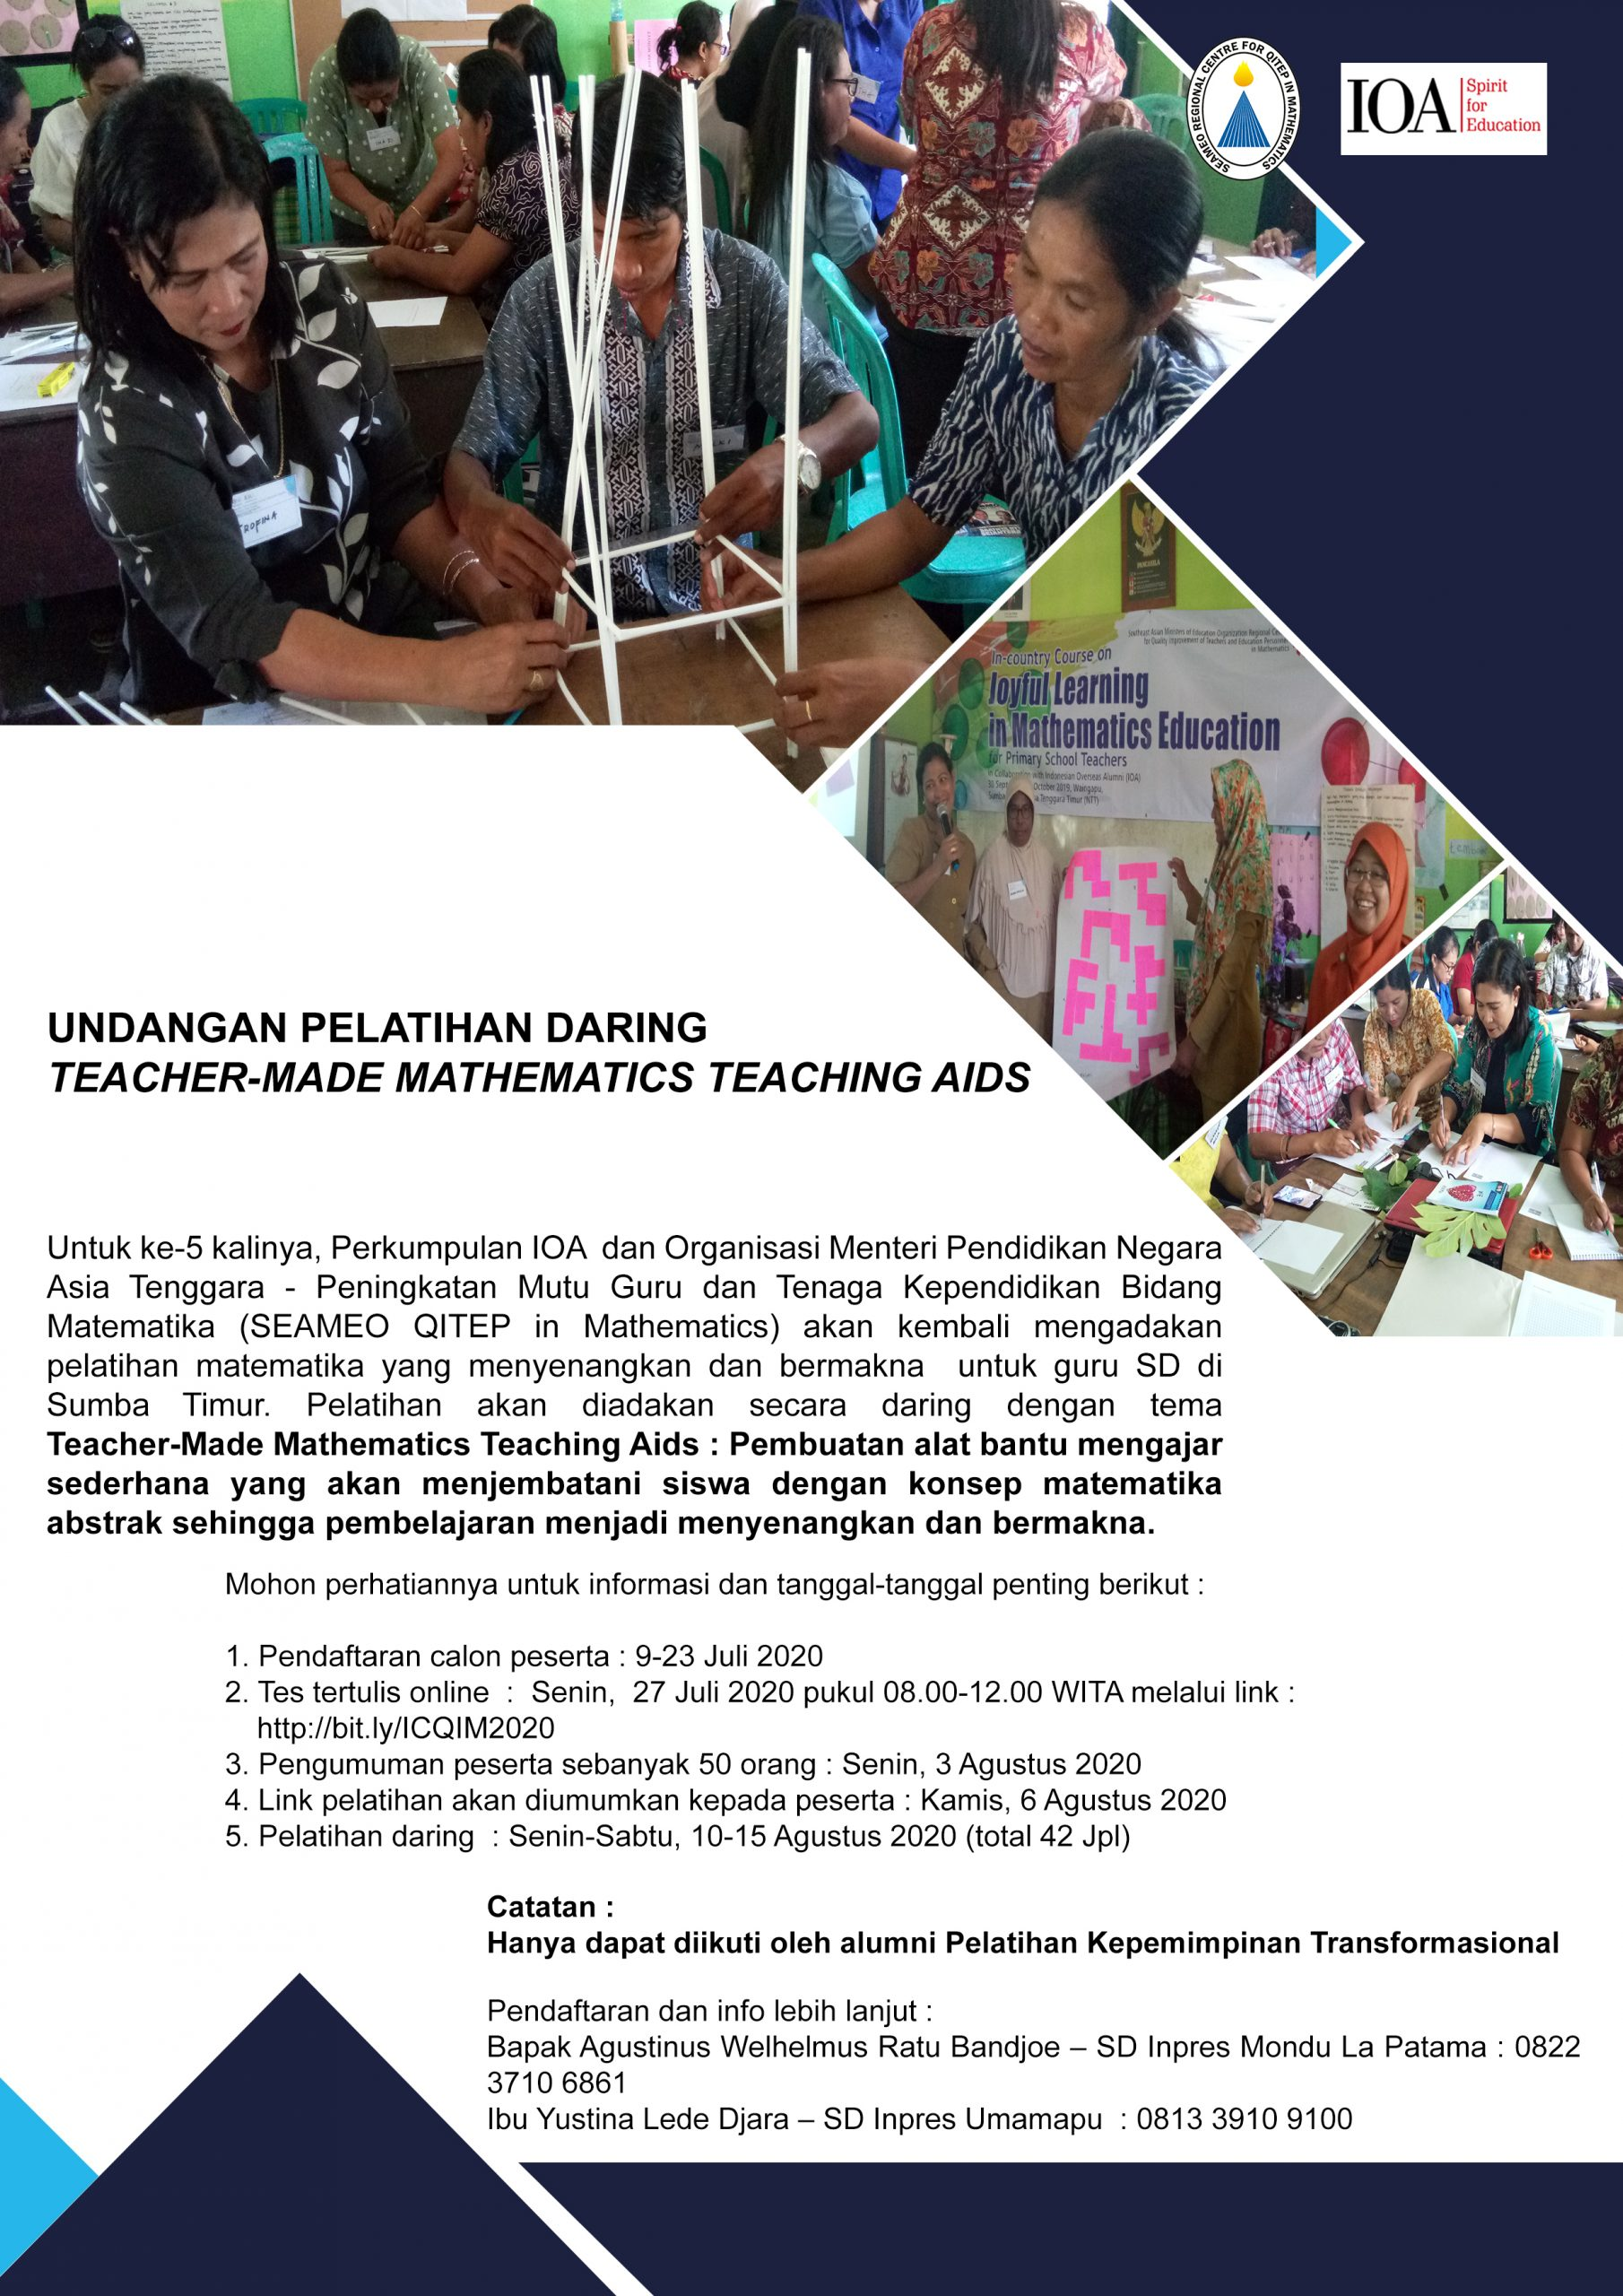 PELATIHAN DARING UNTUK GURU SUMBA TIMUR : TEACHER-MADE MATHEMATICS TEACHING AIDS, 10-15 AGUSTUS 2020